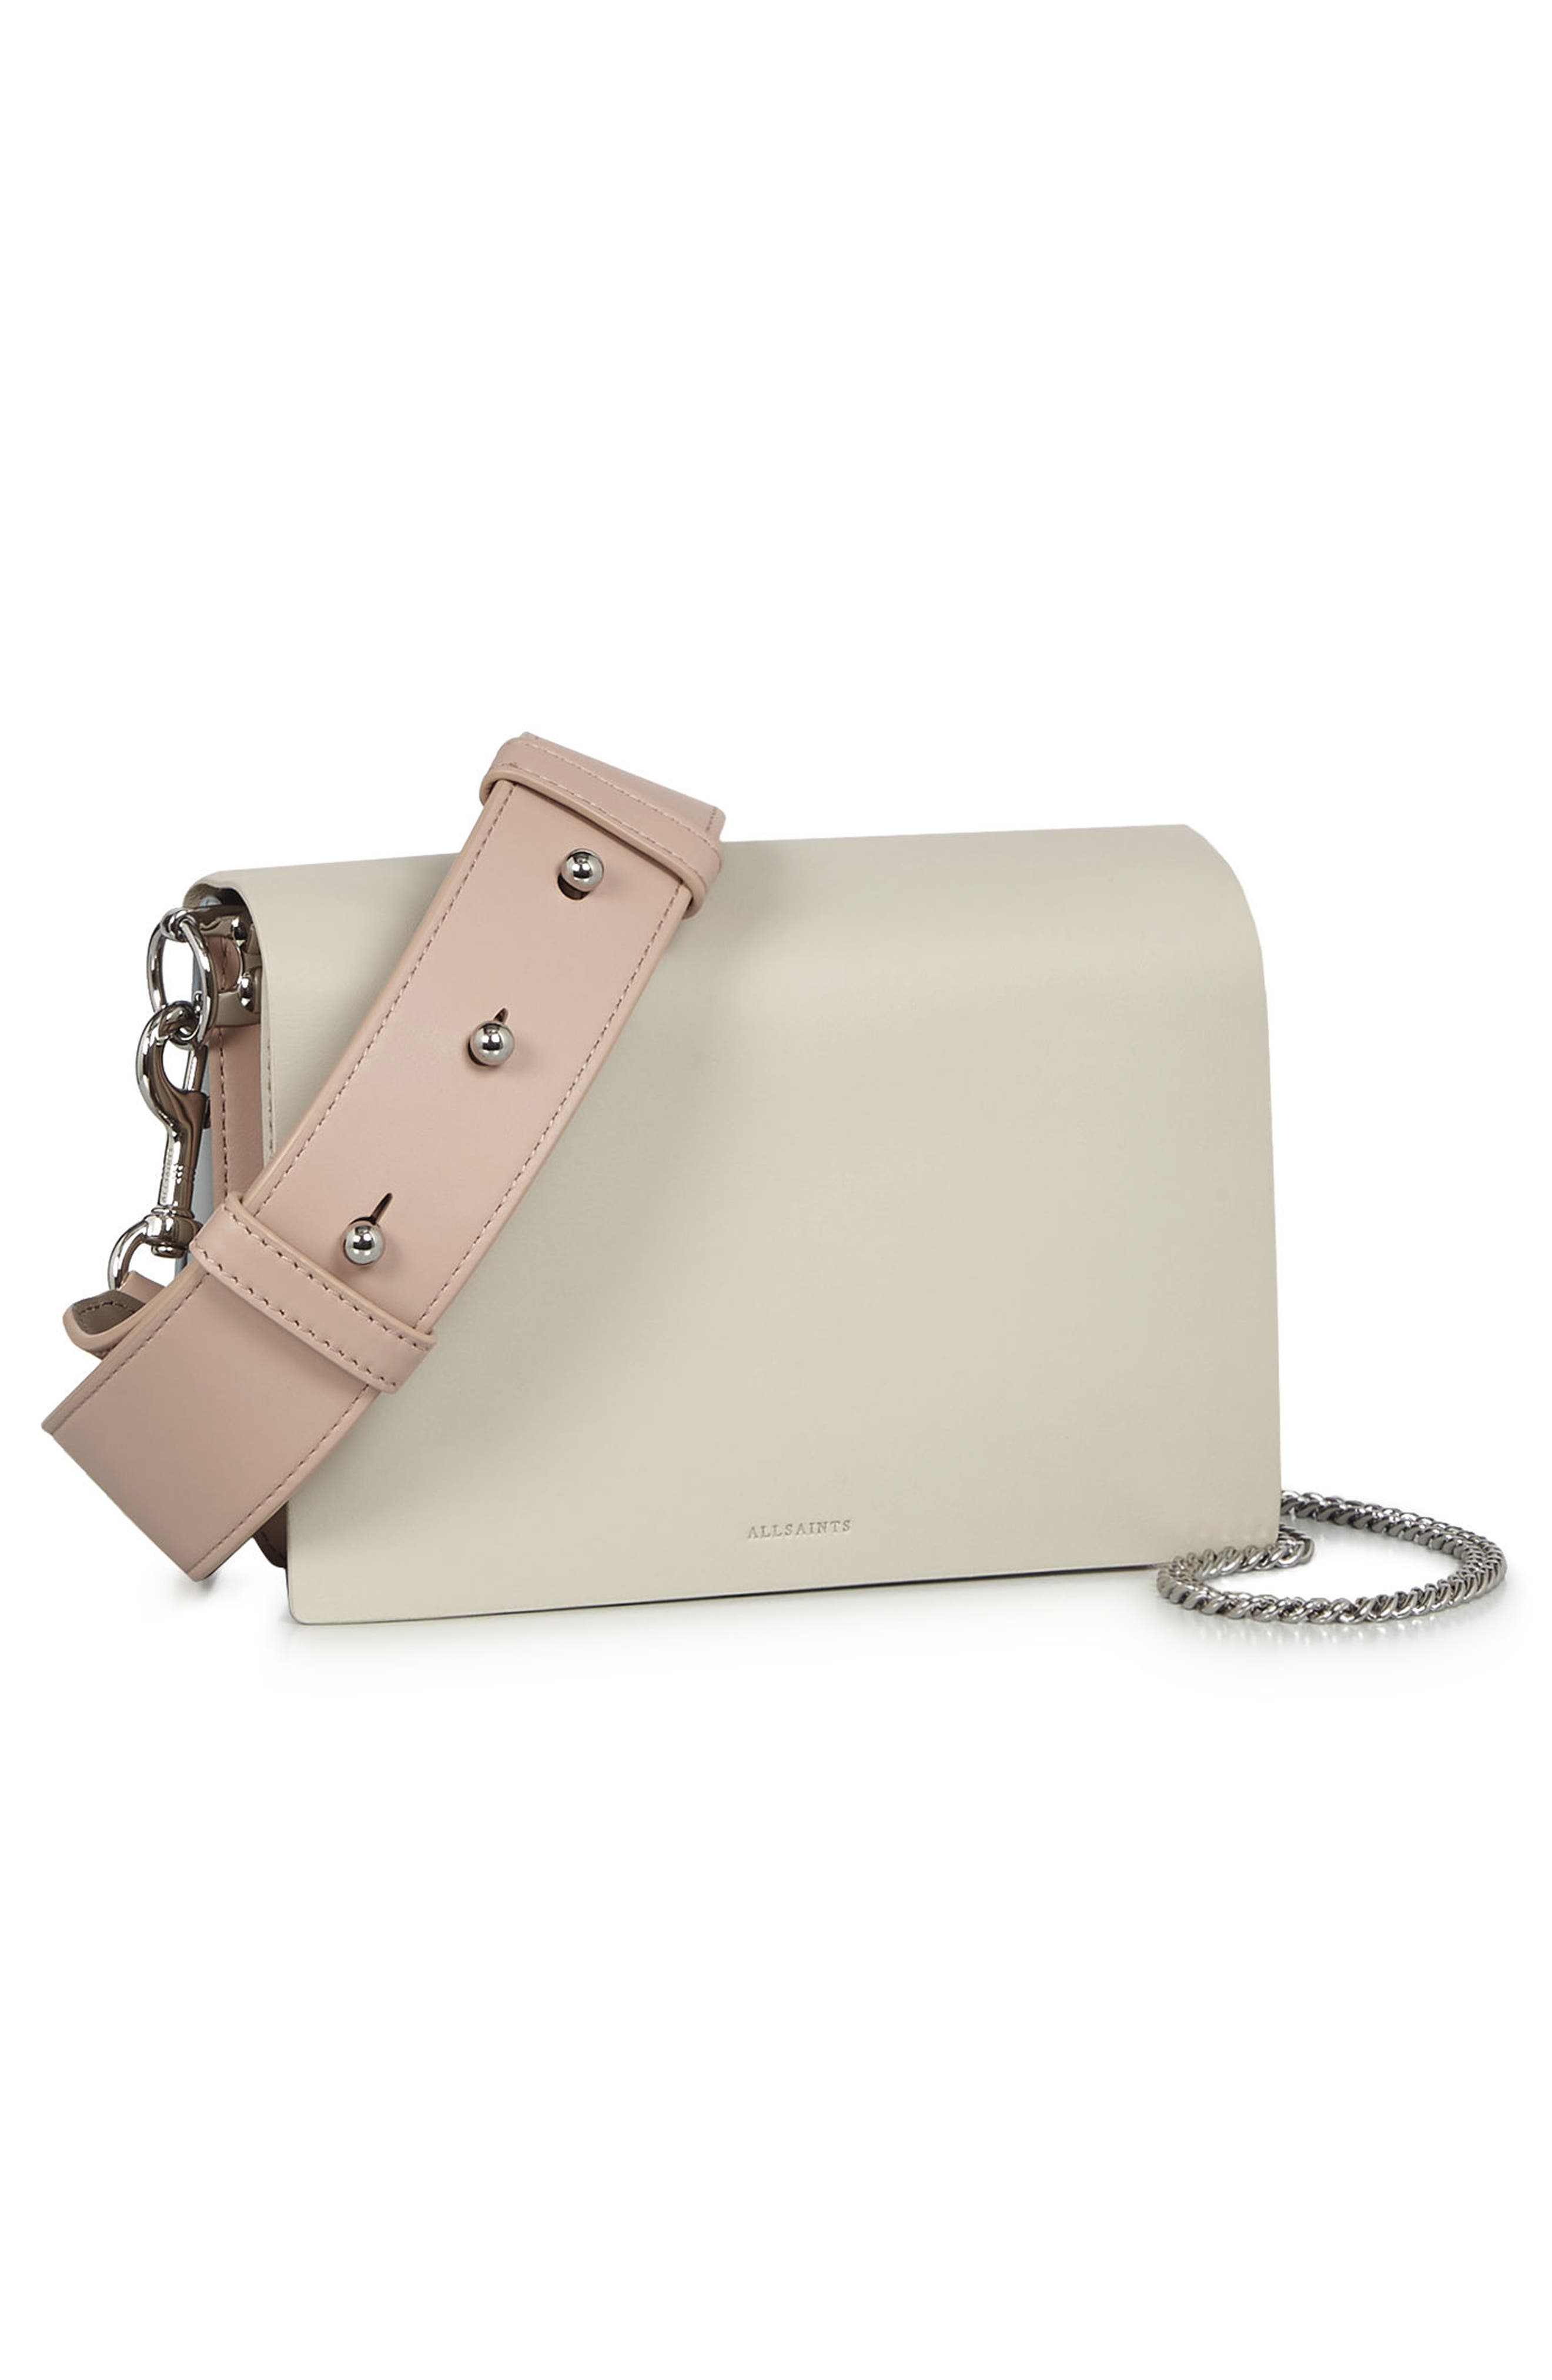 Zep Colorblock Leather Shoulder Bag,                             Alternate thumbnail 6, color,                             115